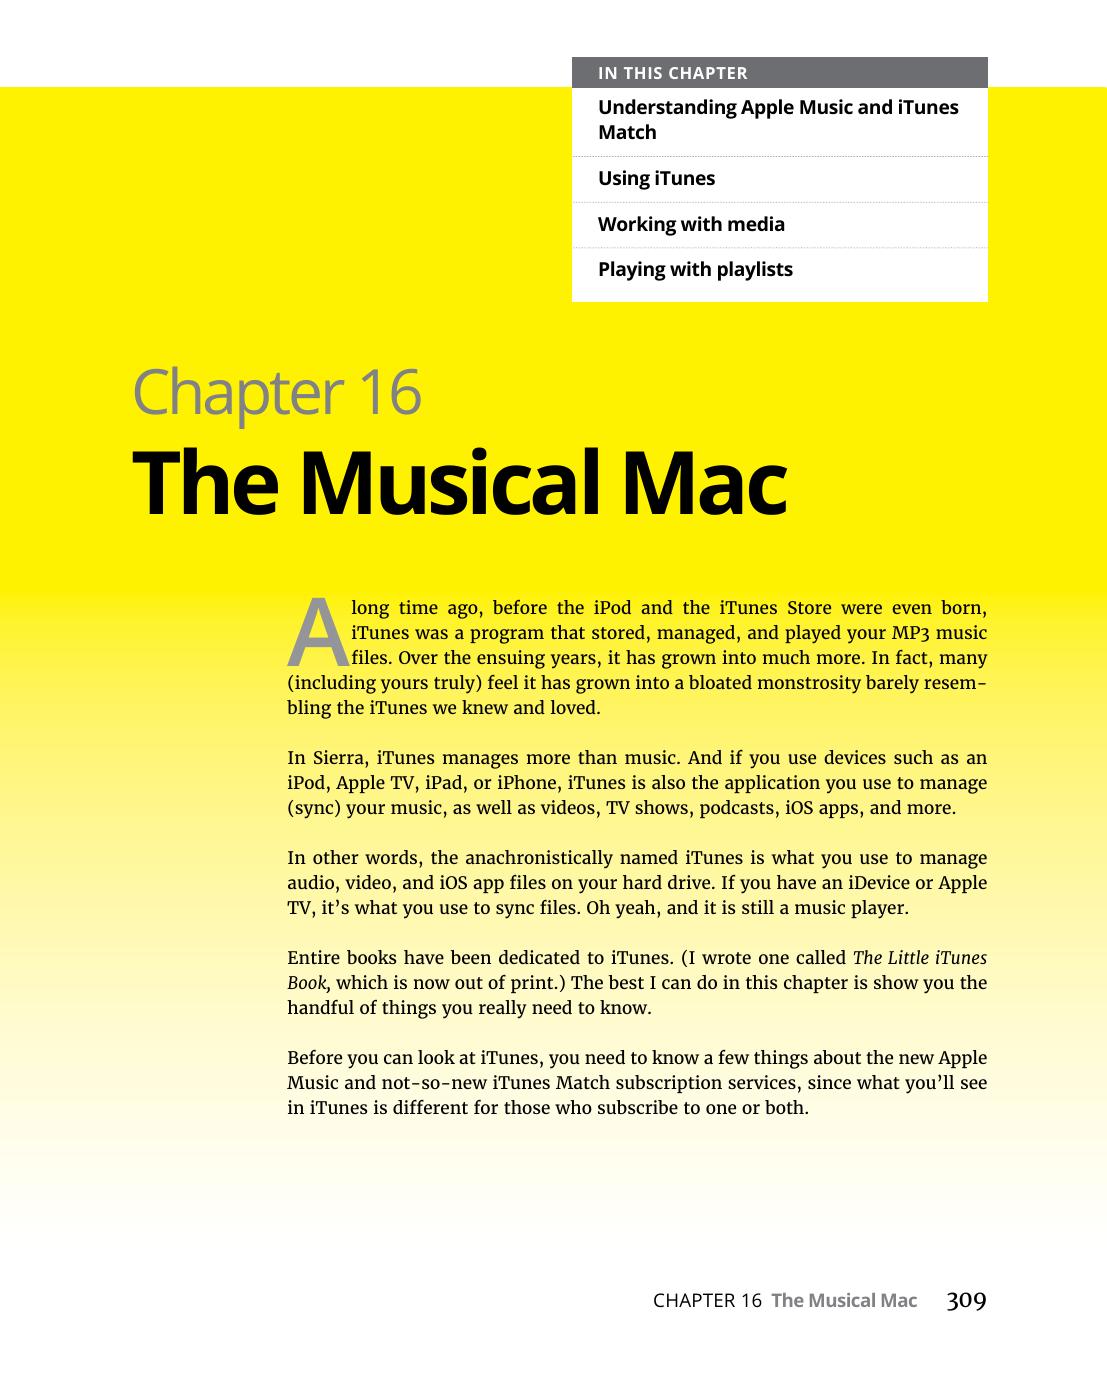 The Musical Mac - Thesis Scientist   manualzz com